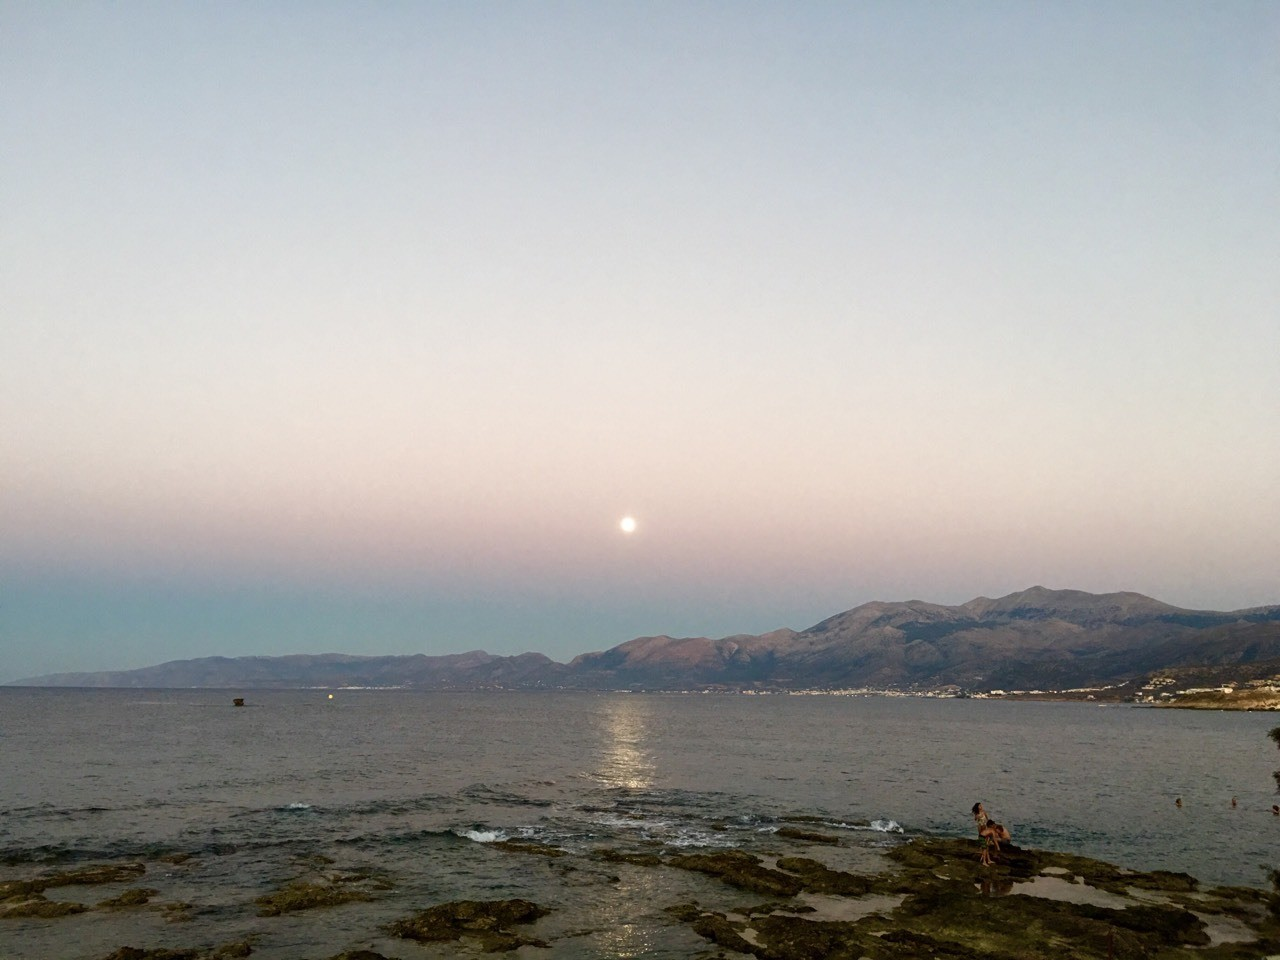 August full-moon in Crete.